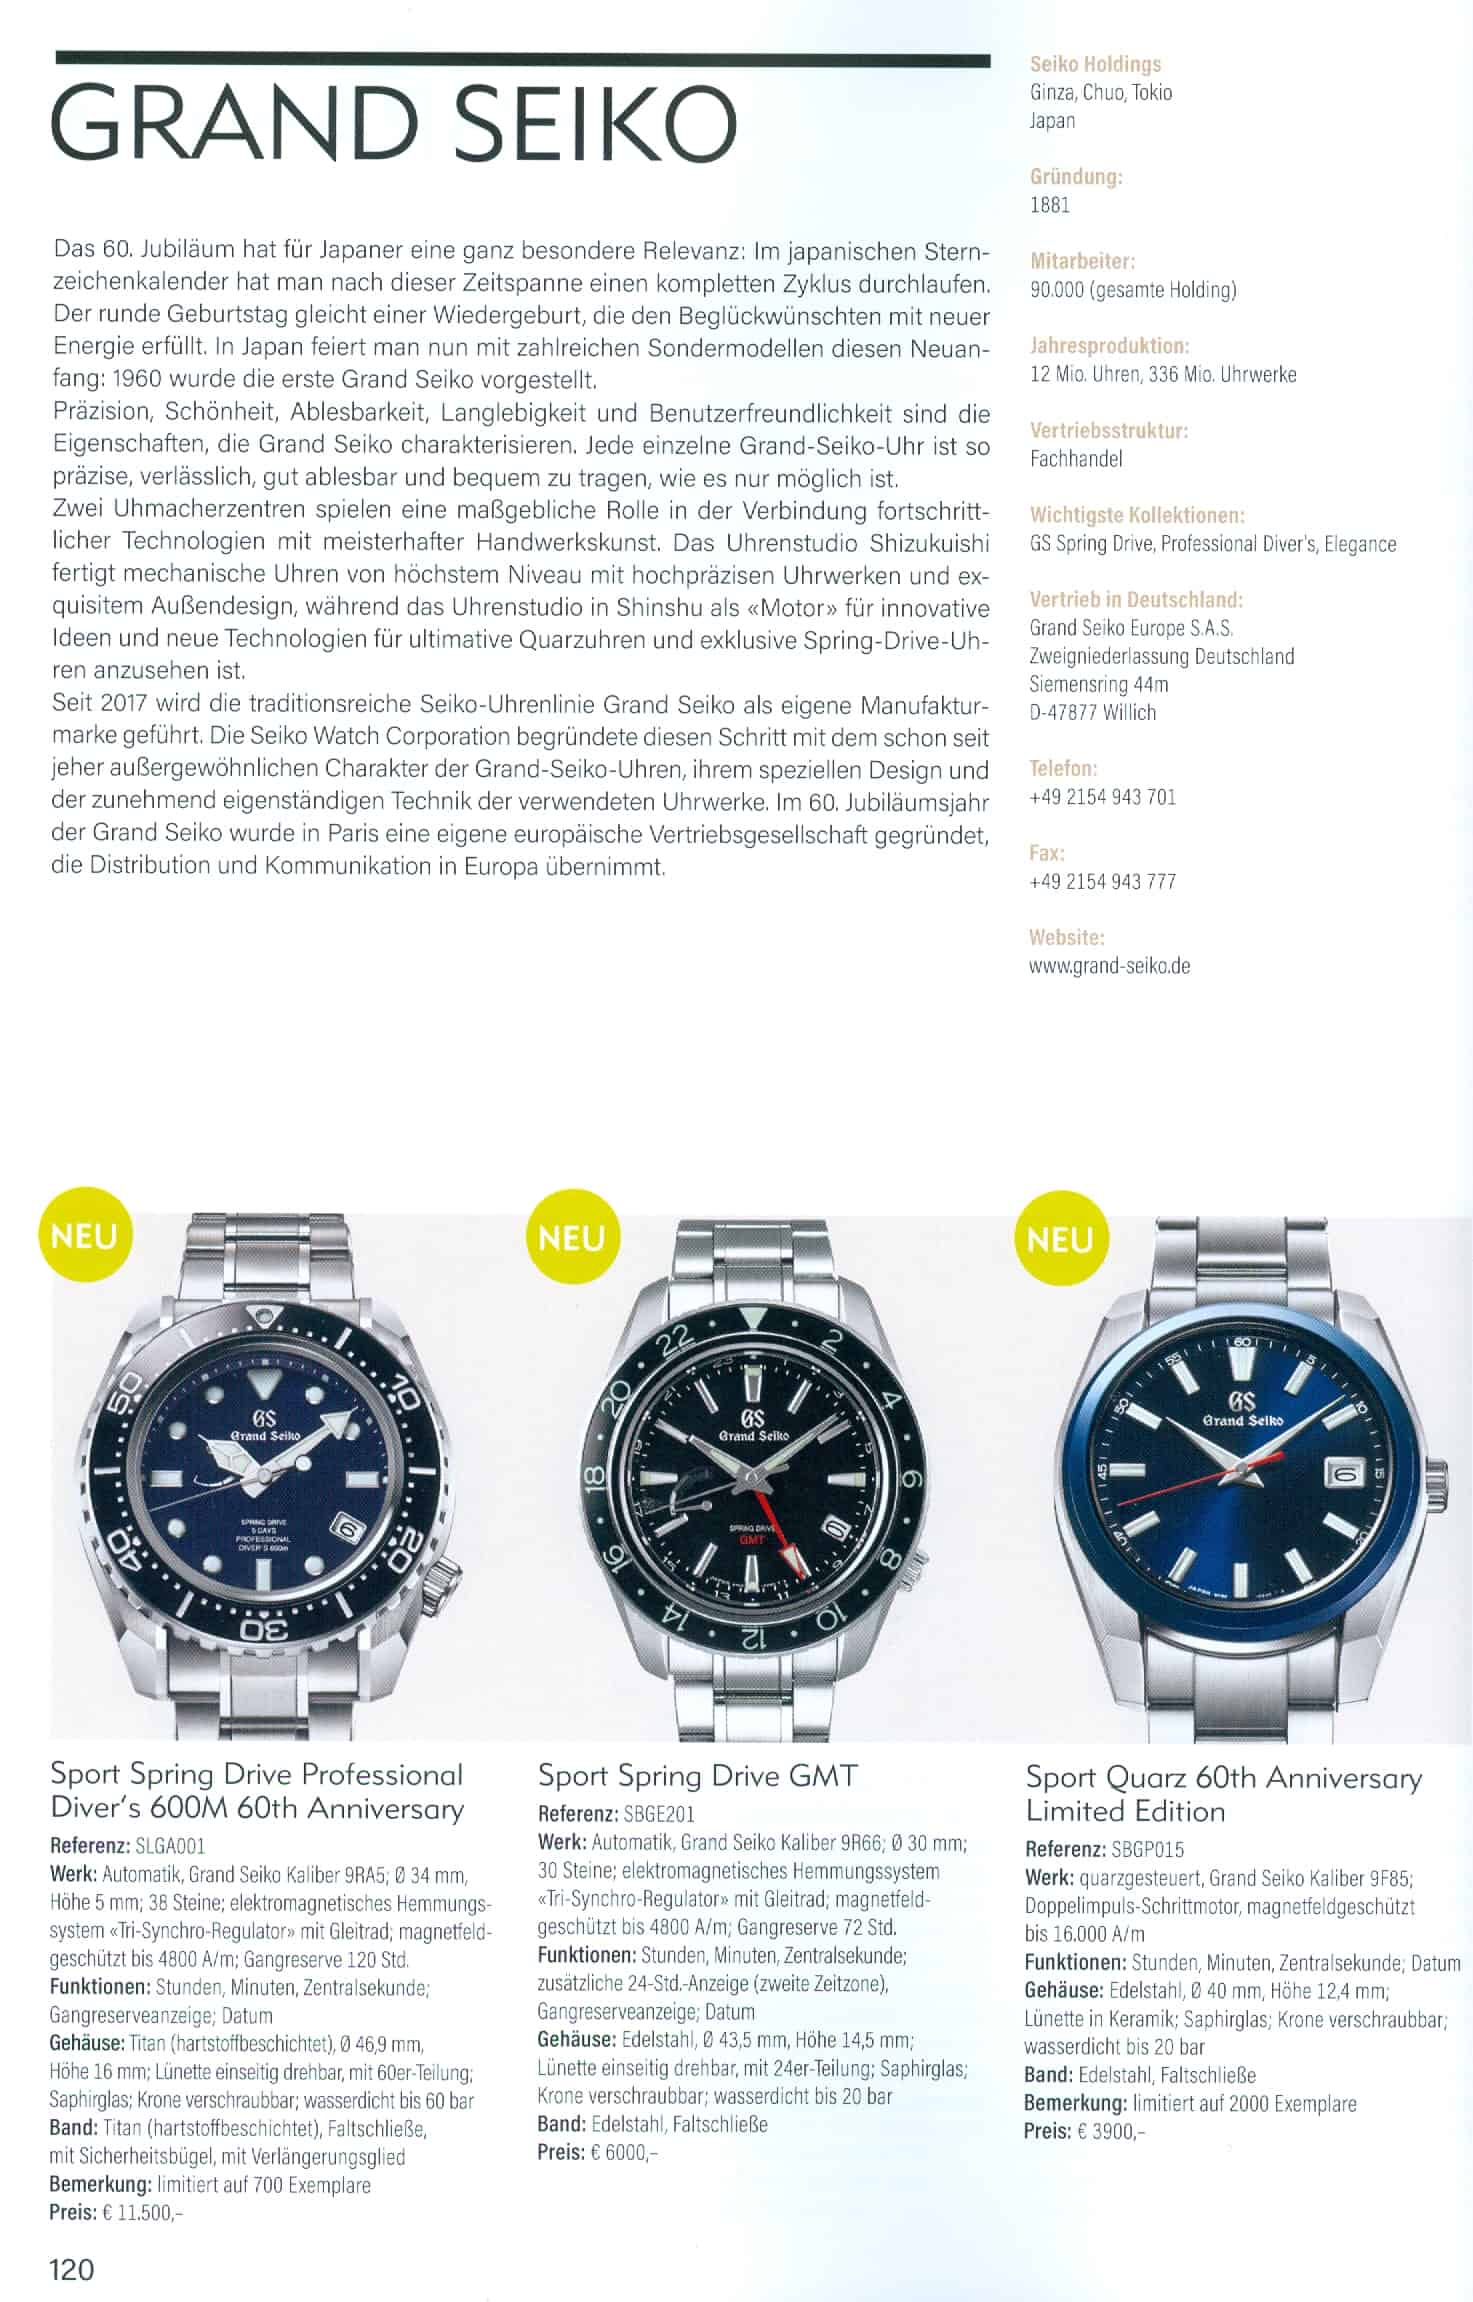 Armbanduhren Katalog Heel Verlag 2020 2021 Grand Seiko